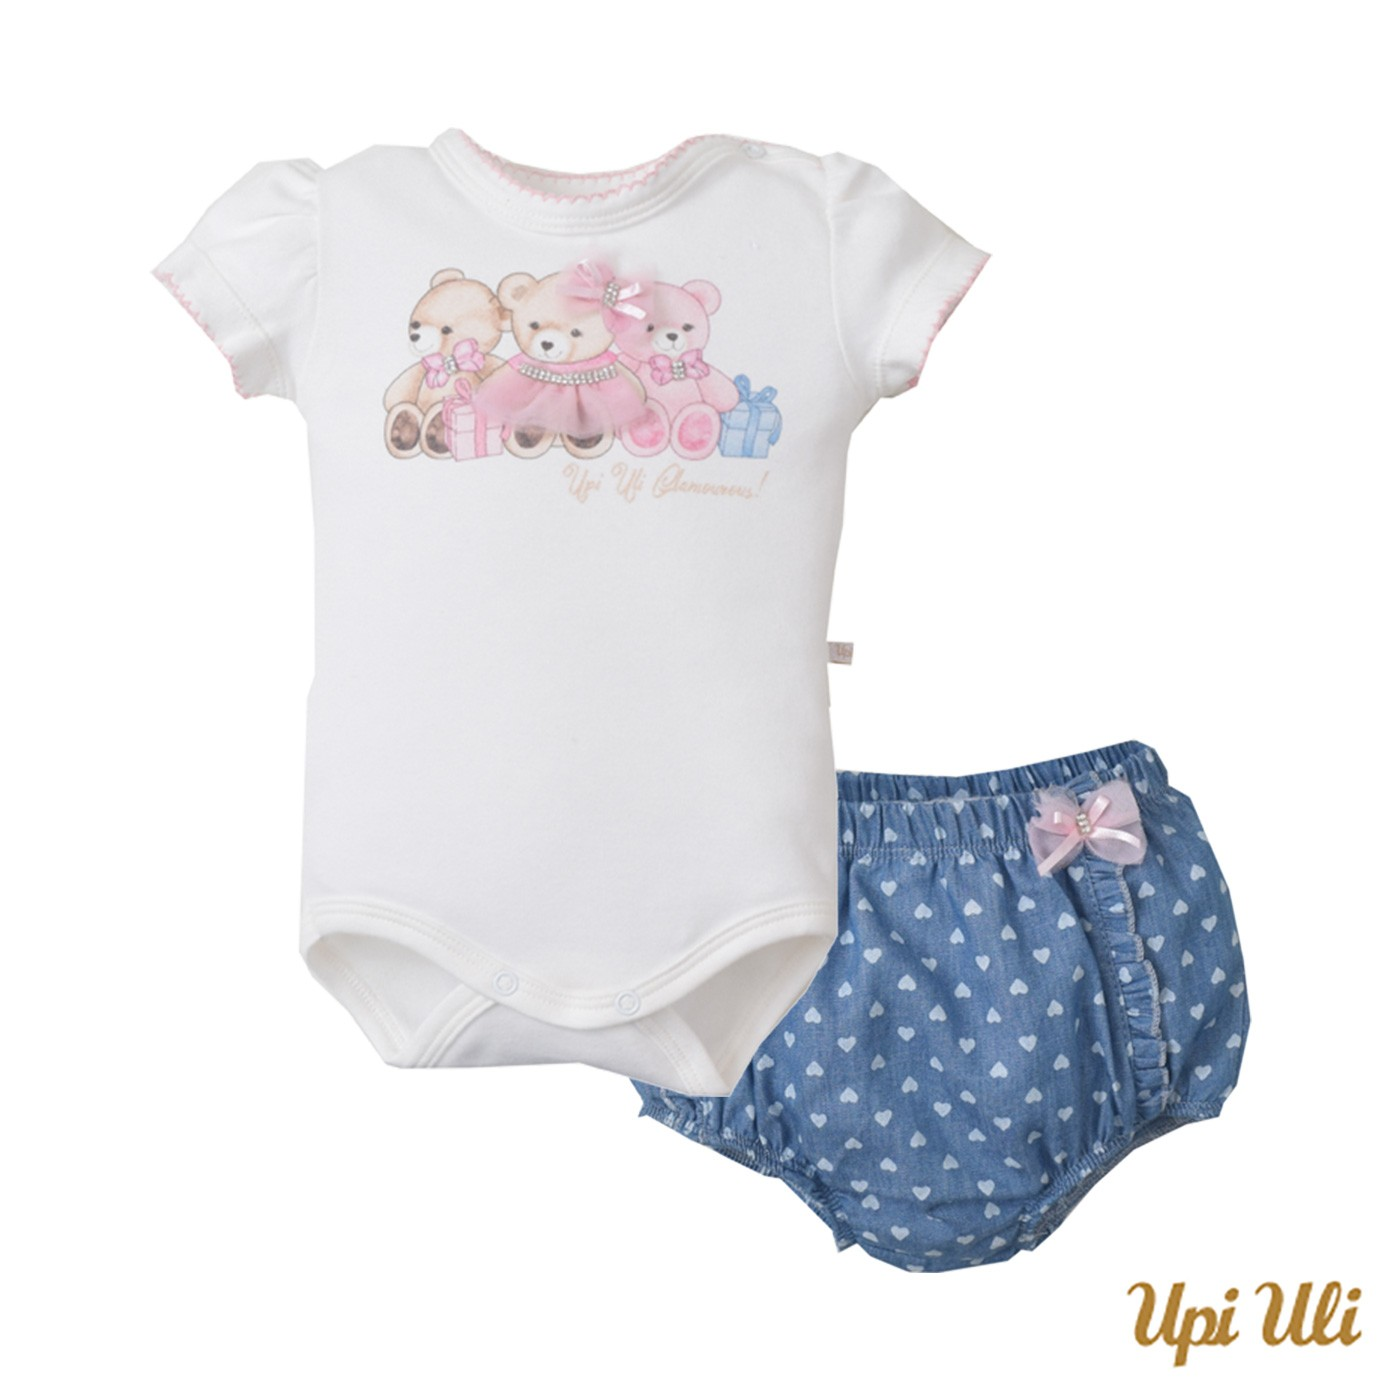 Conj. Body C/ Shorts Suedine/Jeans Ursinhas (9)